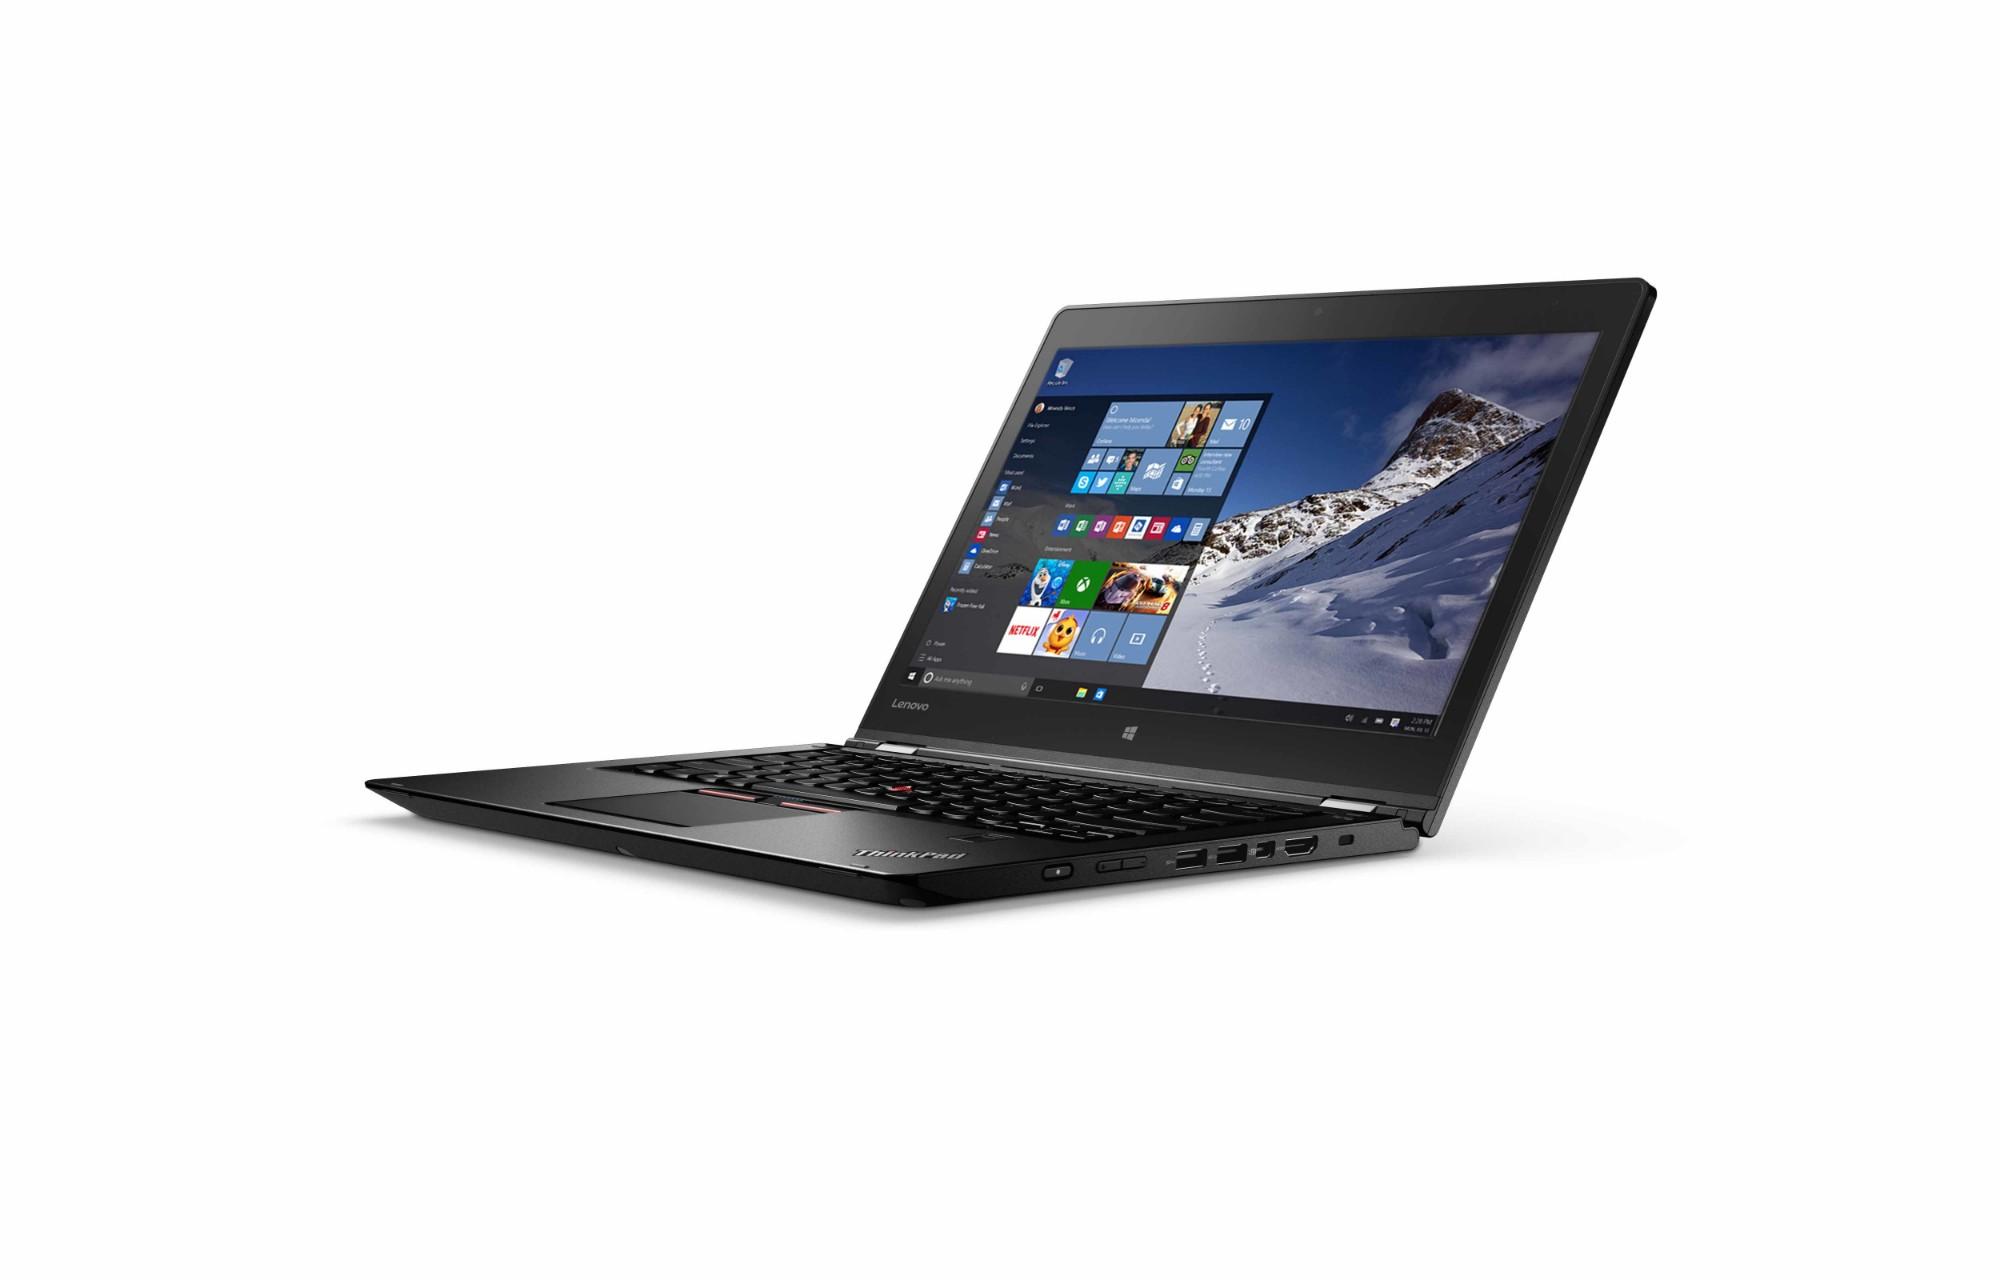 Lenovo ThinkPad P40 Yoga Black Ultrabook 35 6 cm (14